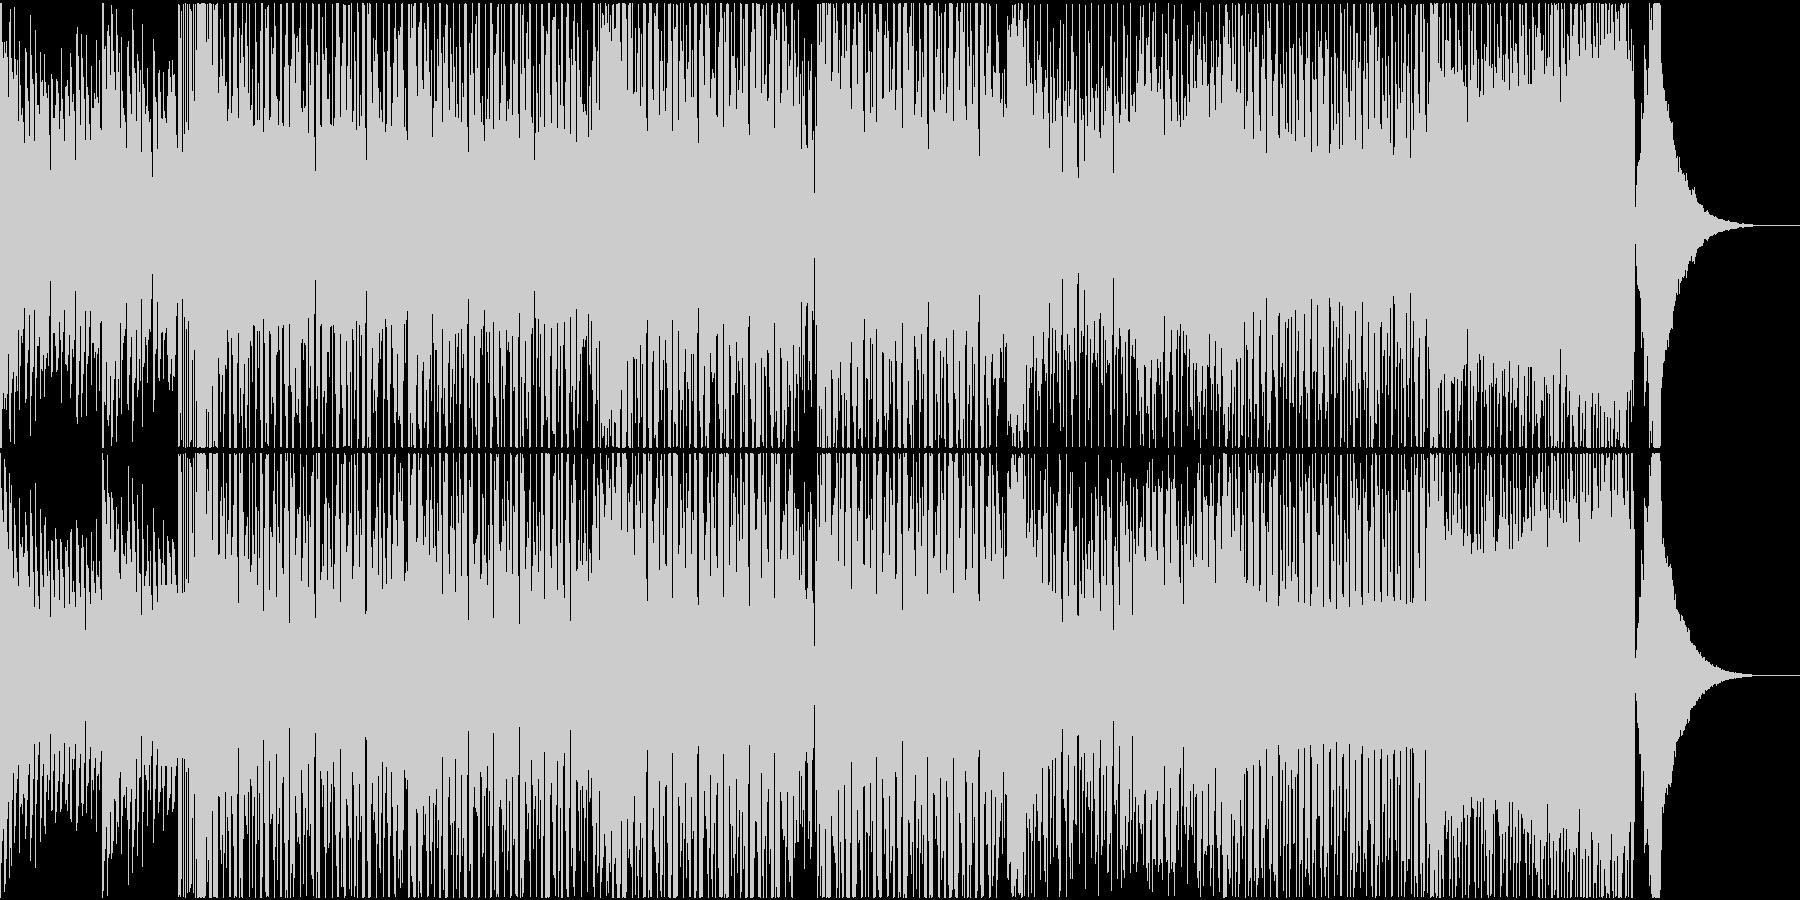 EDM ピアノ スポーツ バラエティの未再生の波形